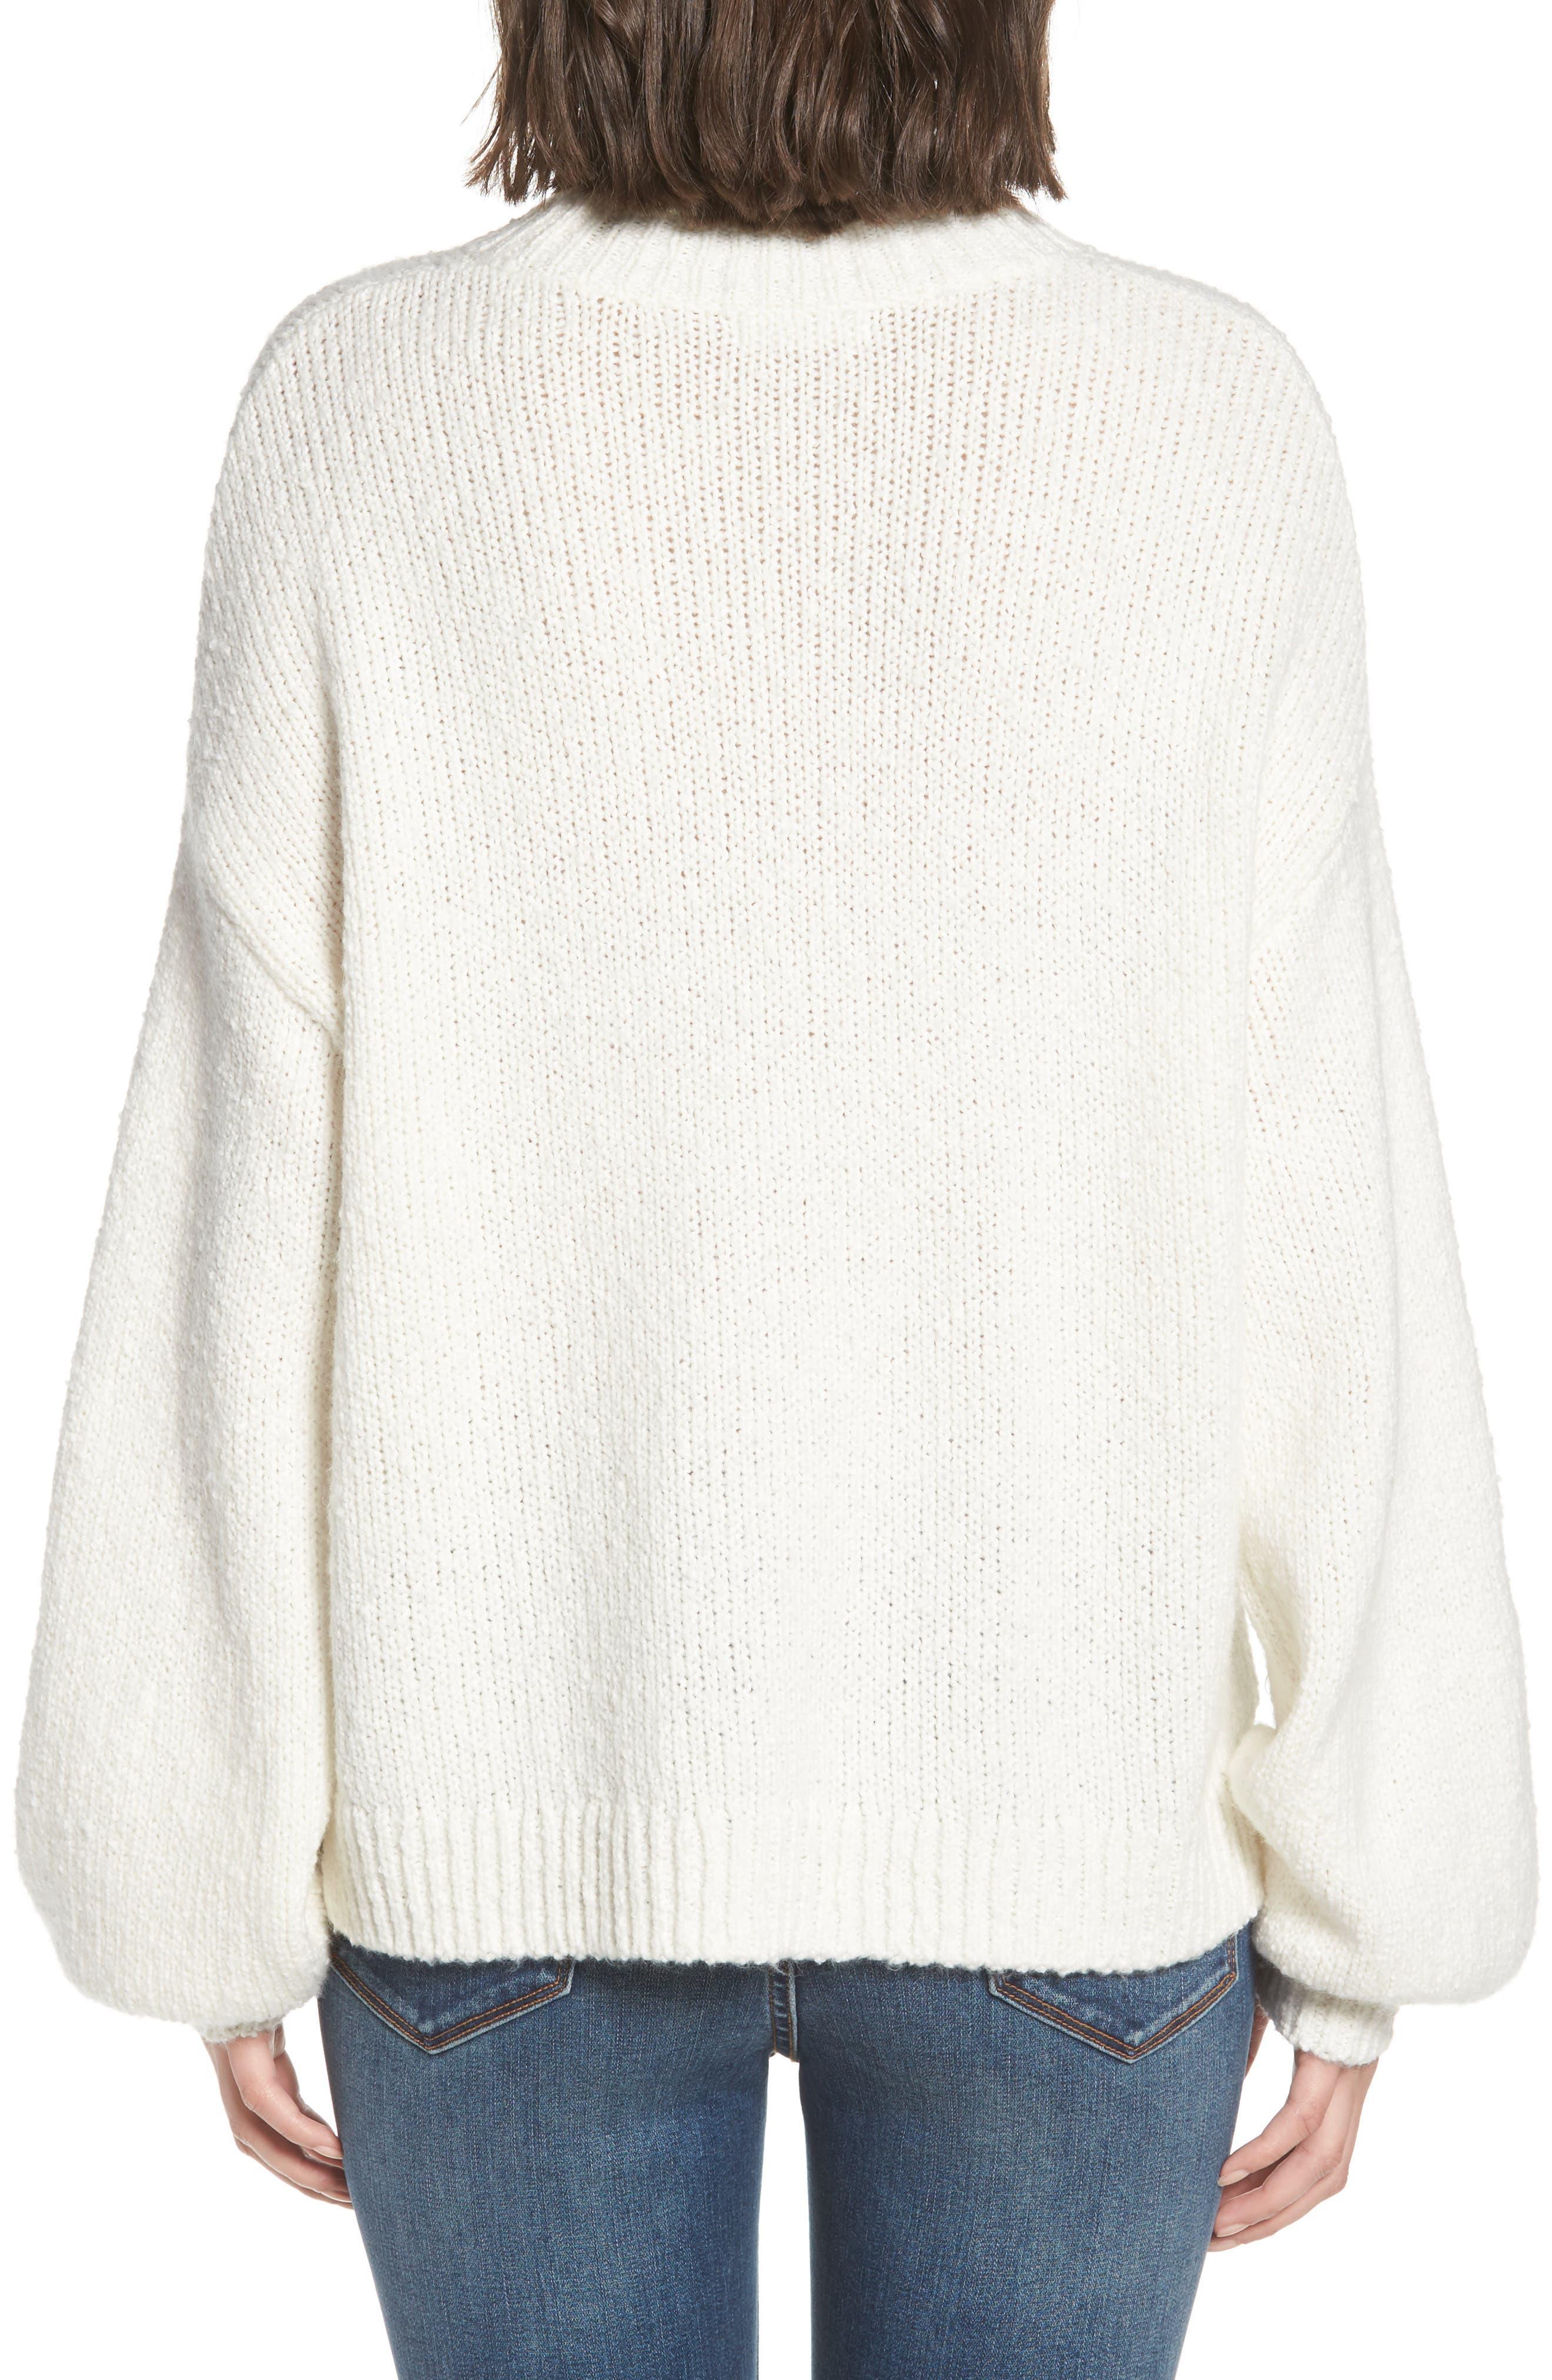 Balloon Sleeve Sweater,                             Alternate thumbnail 2, color,                             Ivory